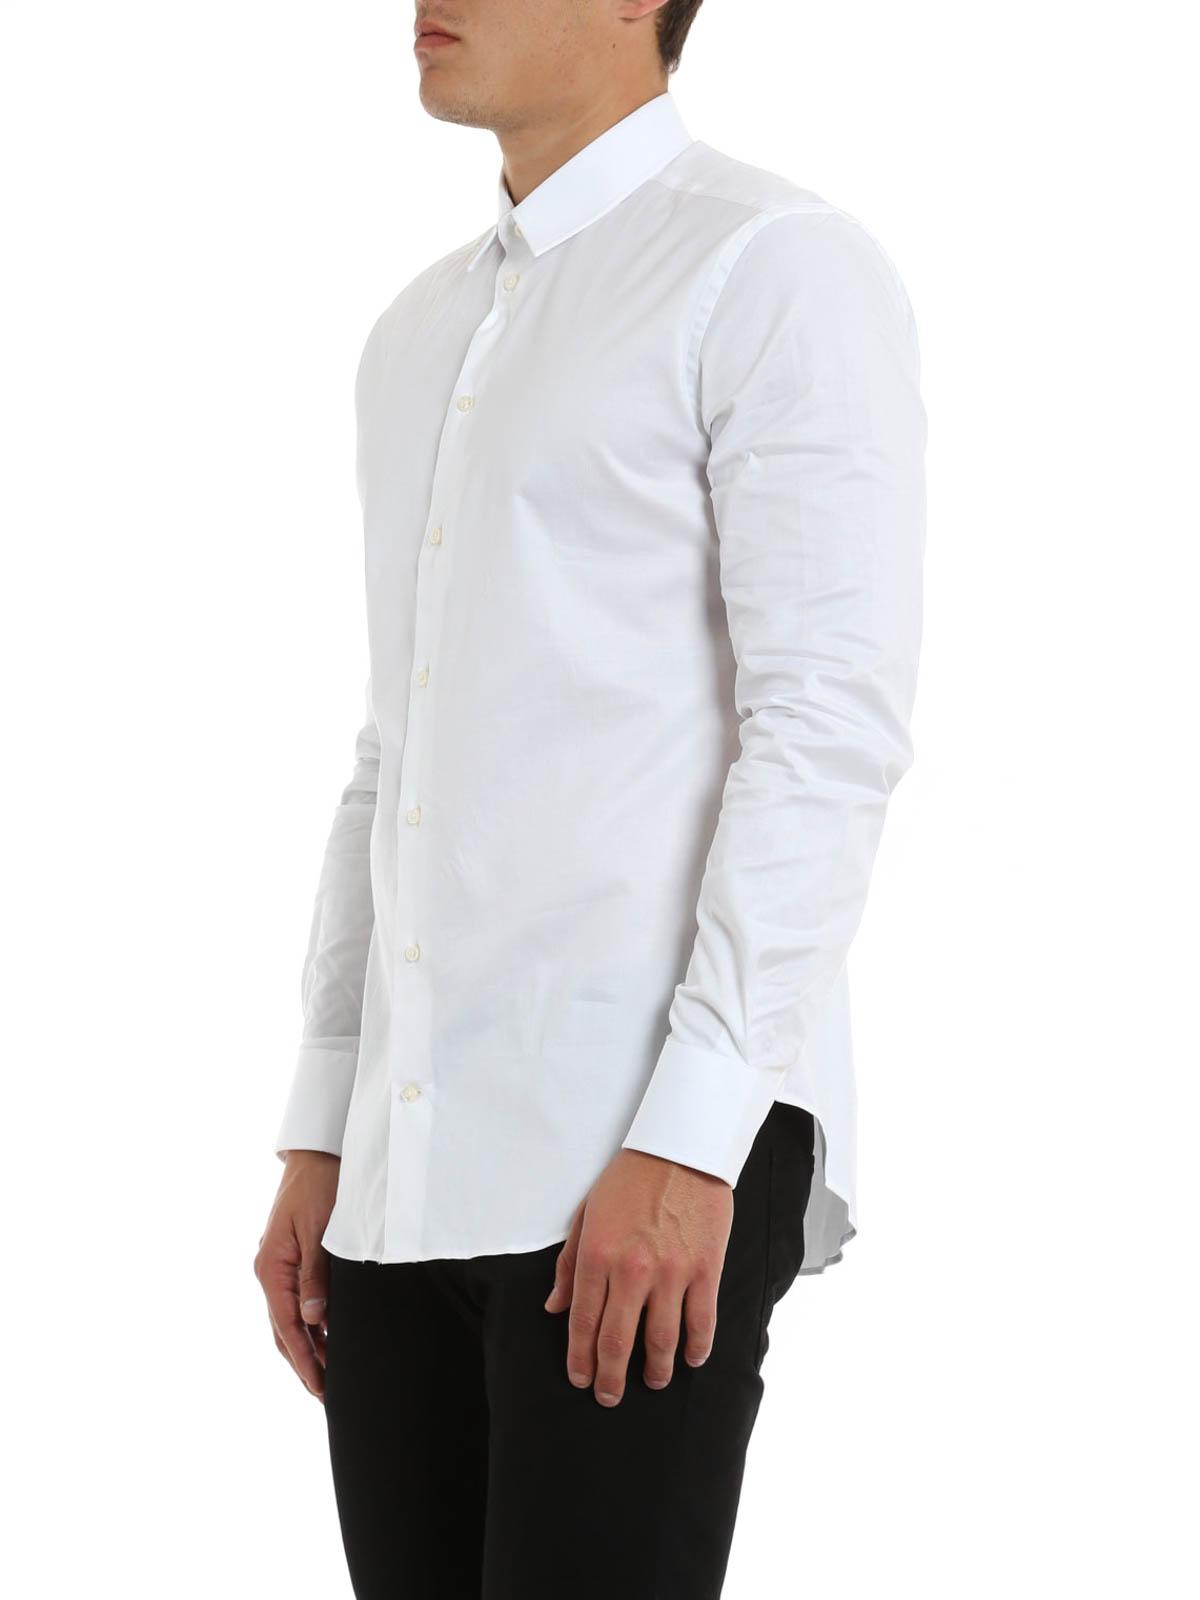 slim fit cotton blend shirt by armani collezioni shirts ForSlim Fit Cotton Shirts